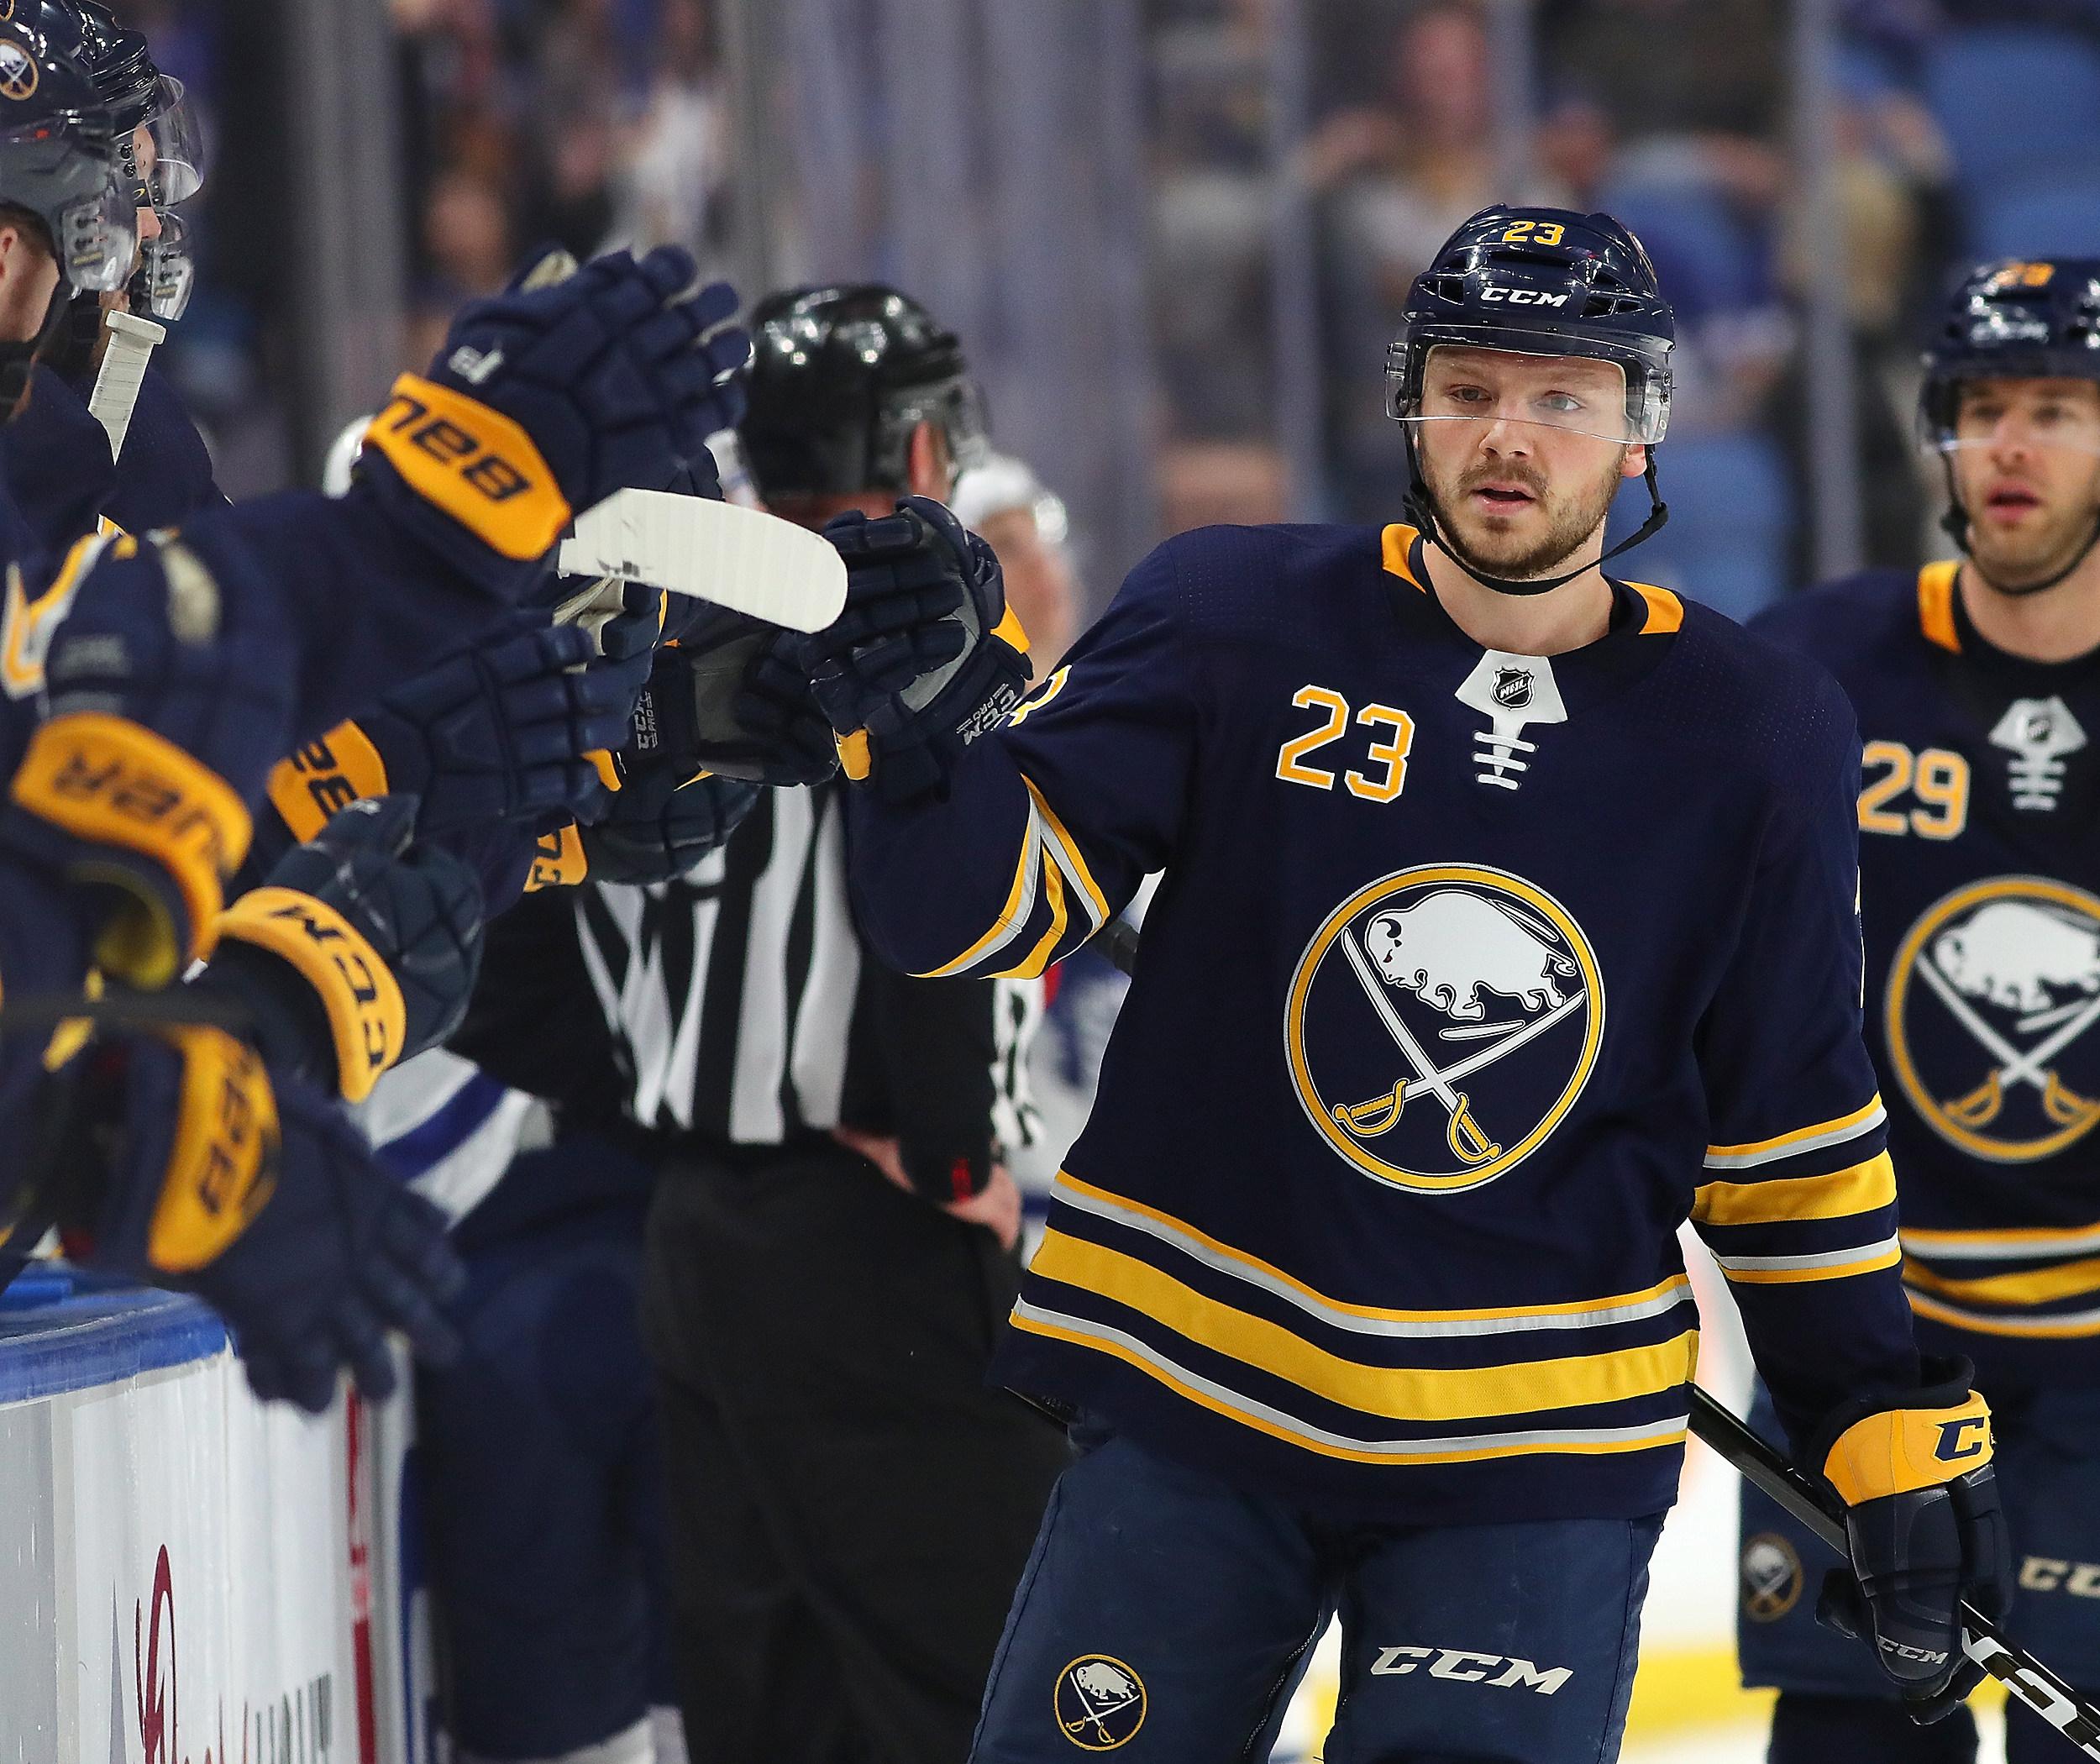 buffalo sabres sweeten the deal for season ticket holders